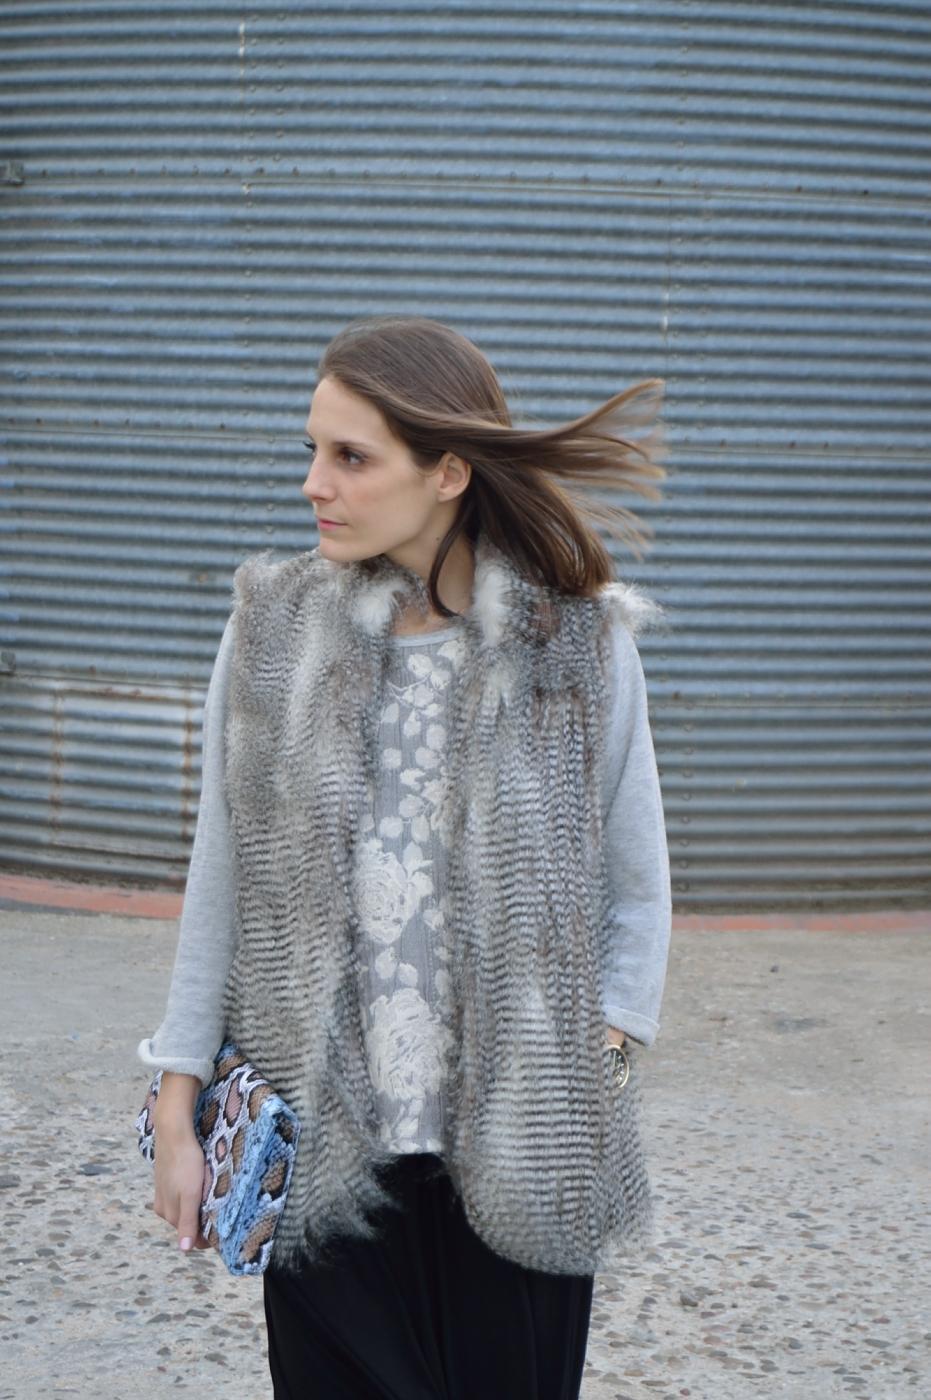 lara-vazquez-madlula-style-ootd-streetstyle-outfit